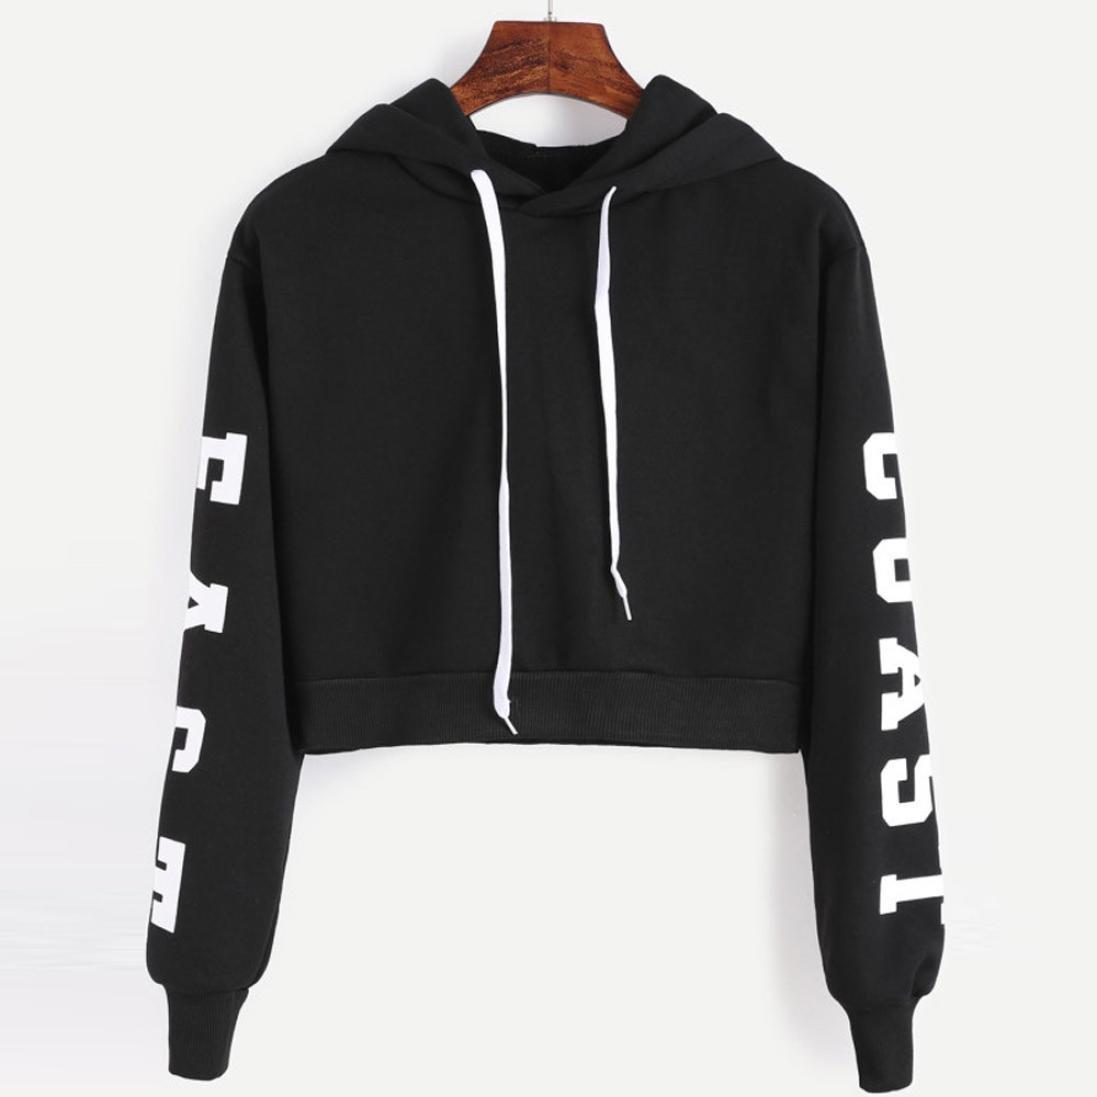 10fa0bc18 Ankola Cropped Hoodies, Women's 2019 Fashion Long Sleeve Patchwork Crop Top  Sweatshirt